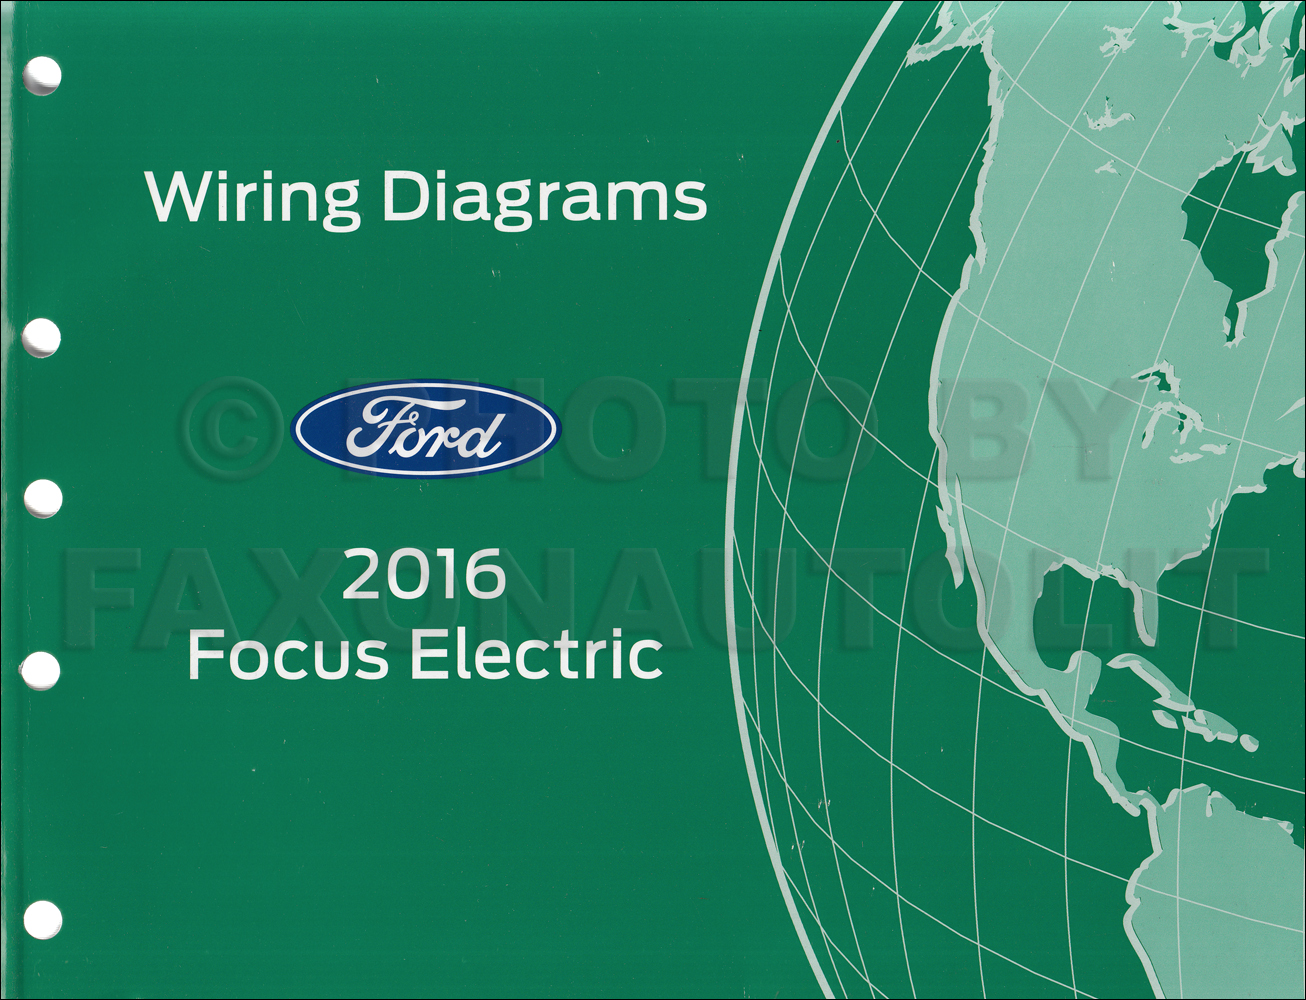 ford fiesta mk7 headlight wiring diagram 2004 f350 fuse box festiva electrical library 2016 focus electric manual original all plug in